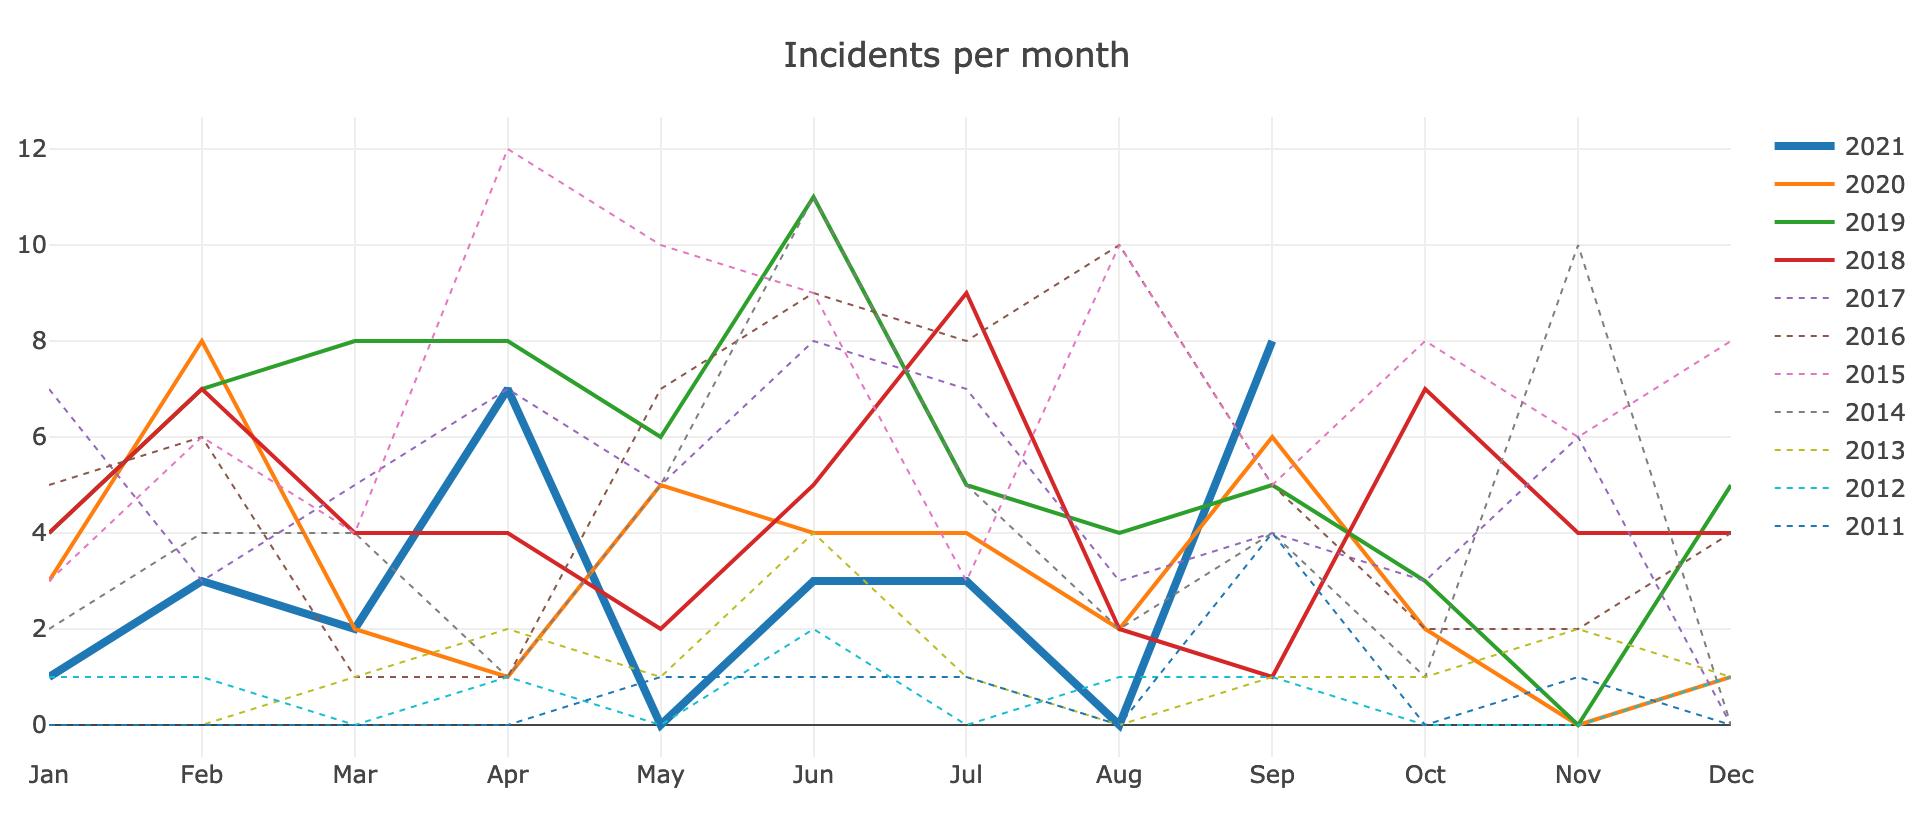 proderr-incidents 2021-09.png (830×1 px, 170 KB)